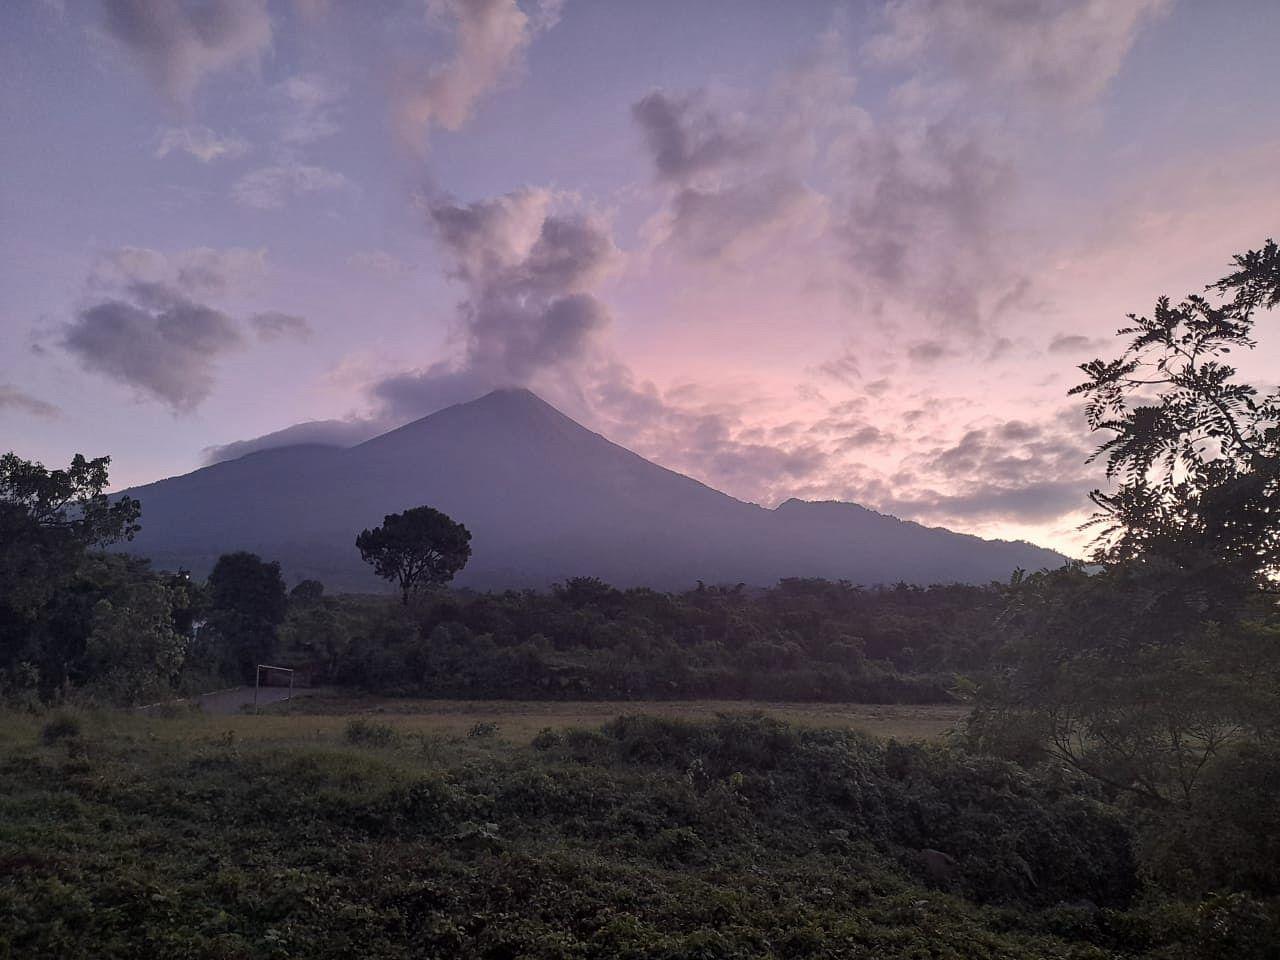 Fuego - fumaroles after the eruptive episode - photo Conred 24.09.2021